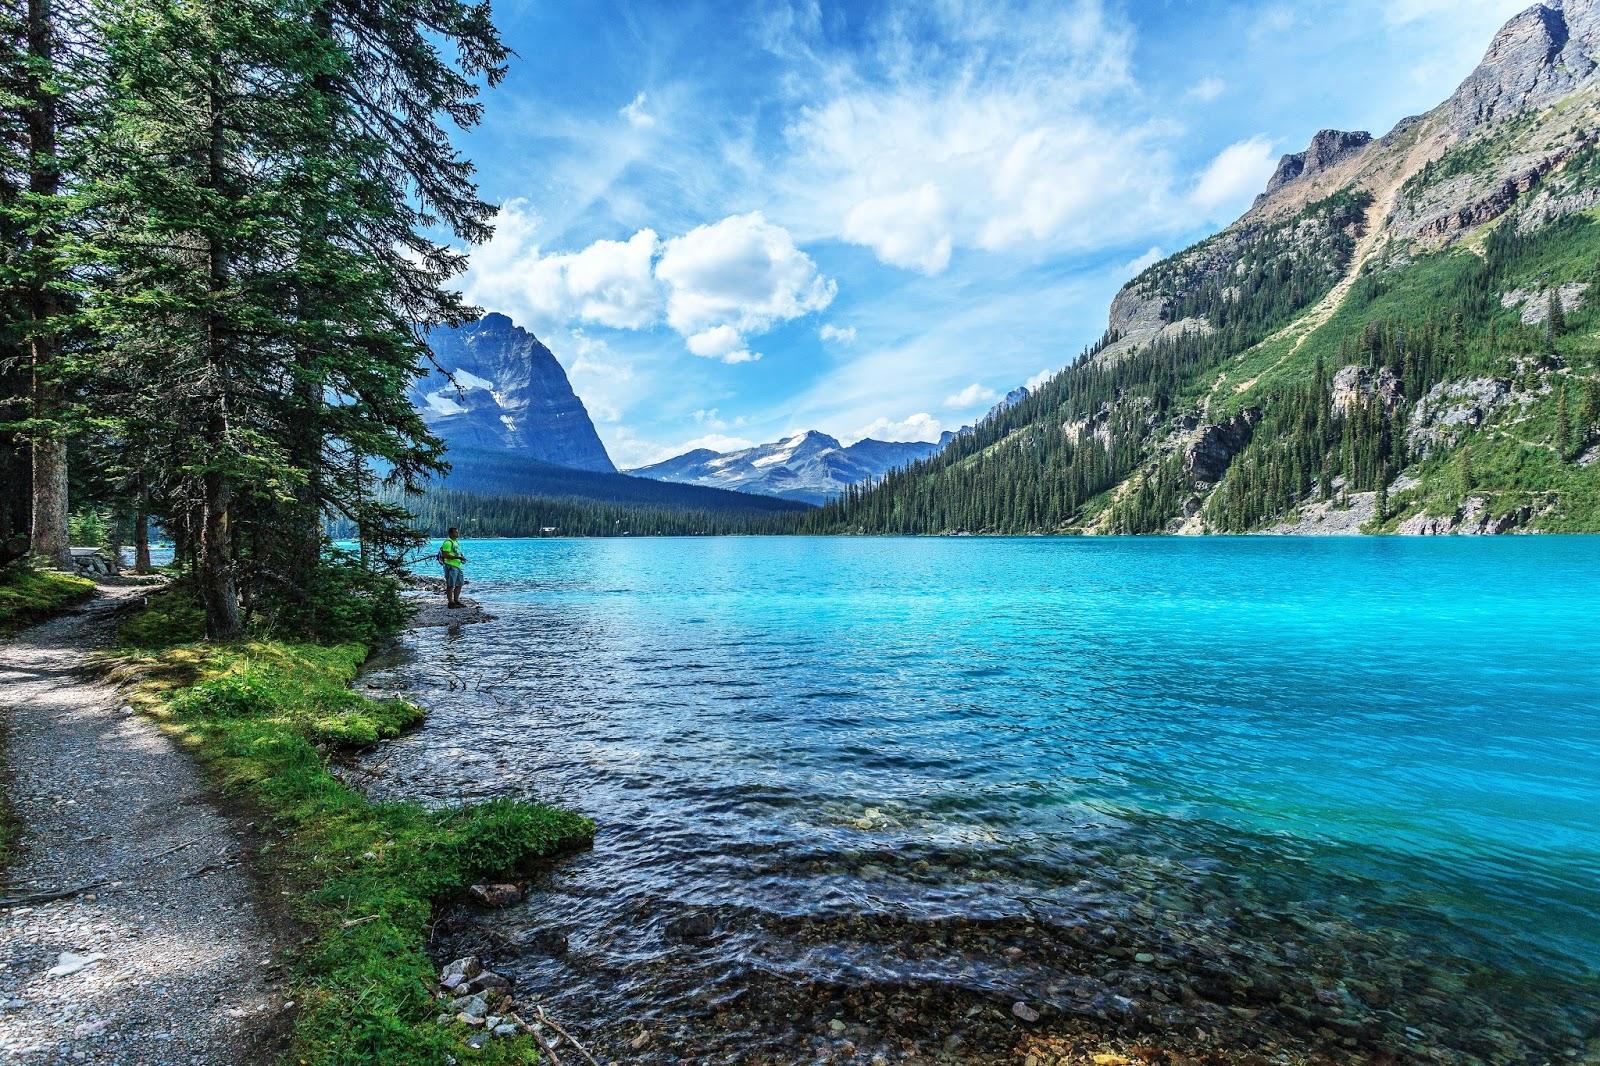 Imagenes De Paisajes Espectaculares - Imagenes de Paisajes: hermosos gratis